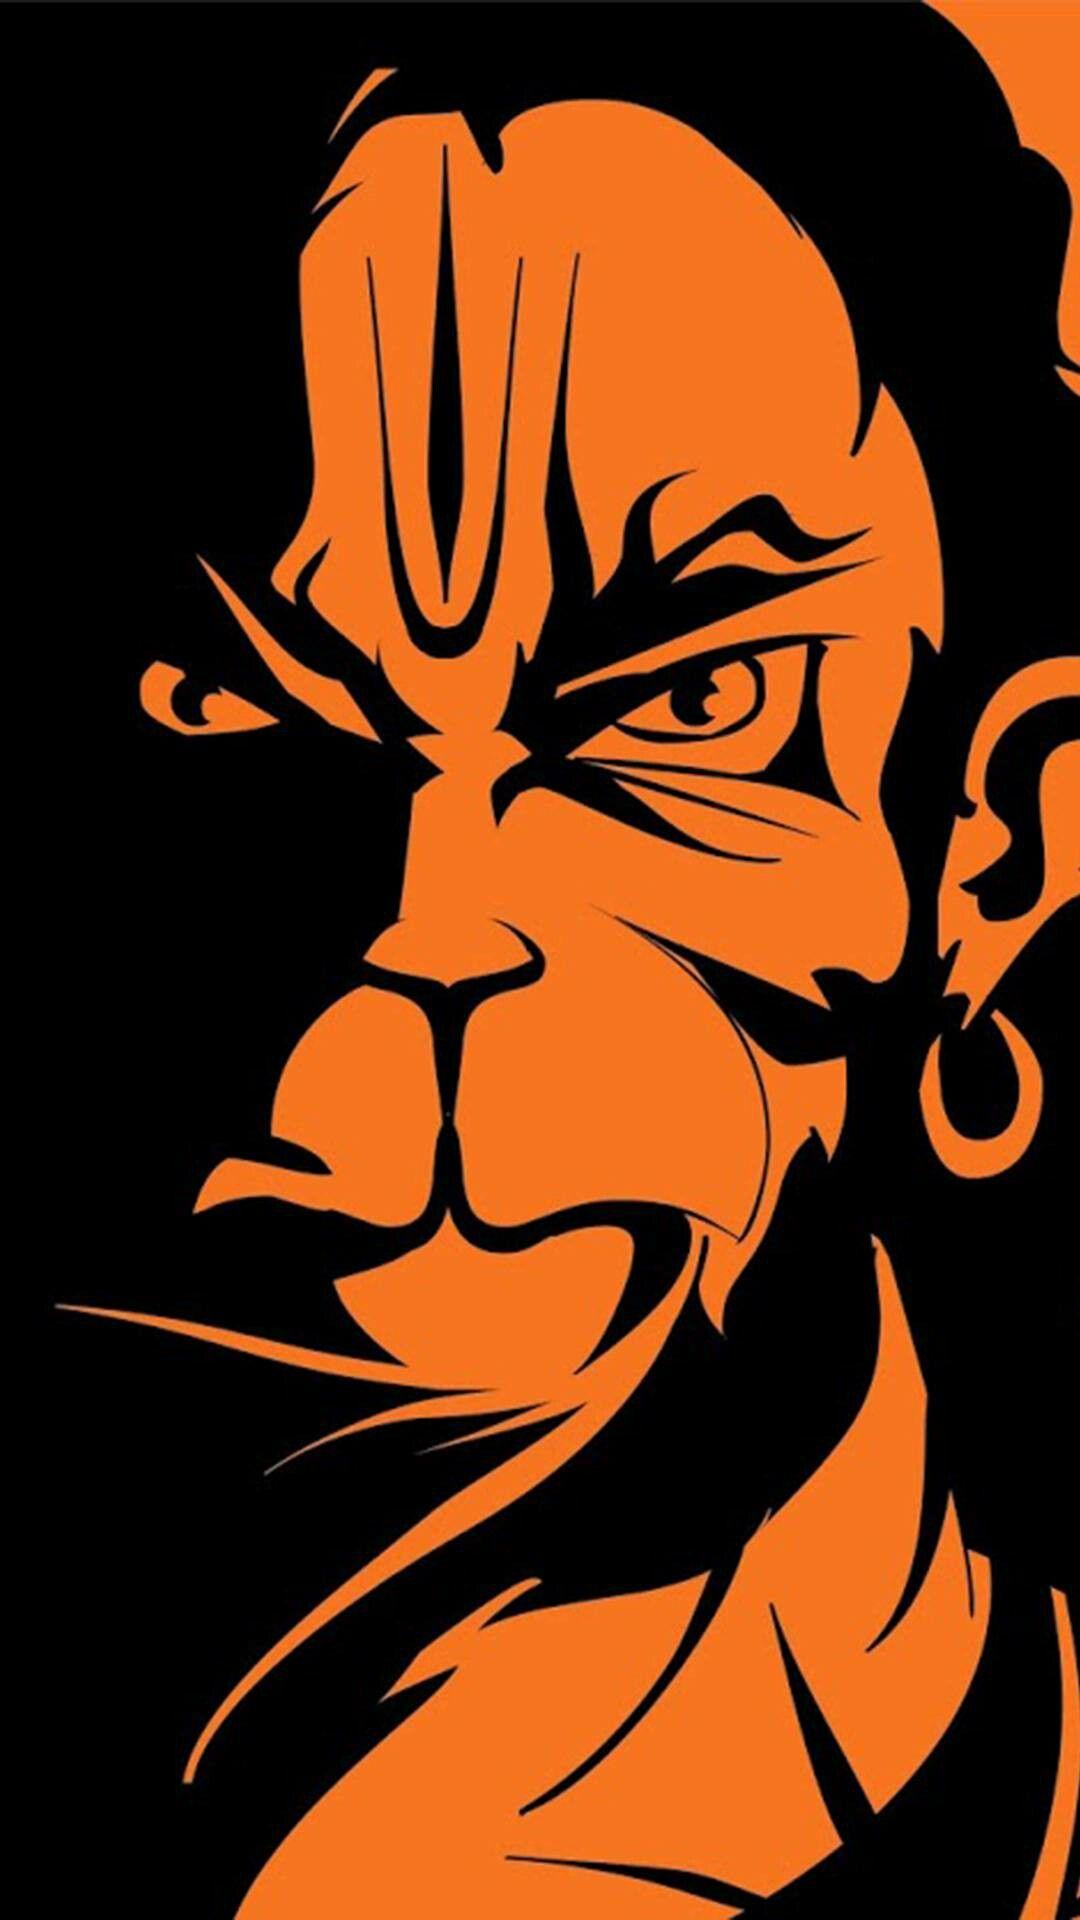 Pardeep hanuman pics hanuman chalisa shri ganesh lord ganesha lord shiva